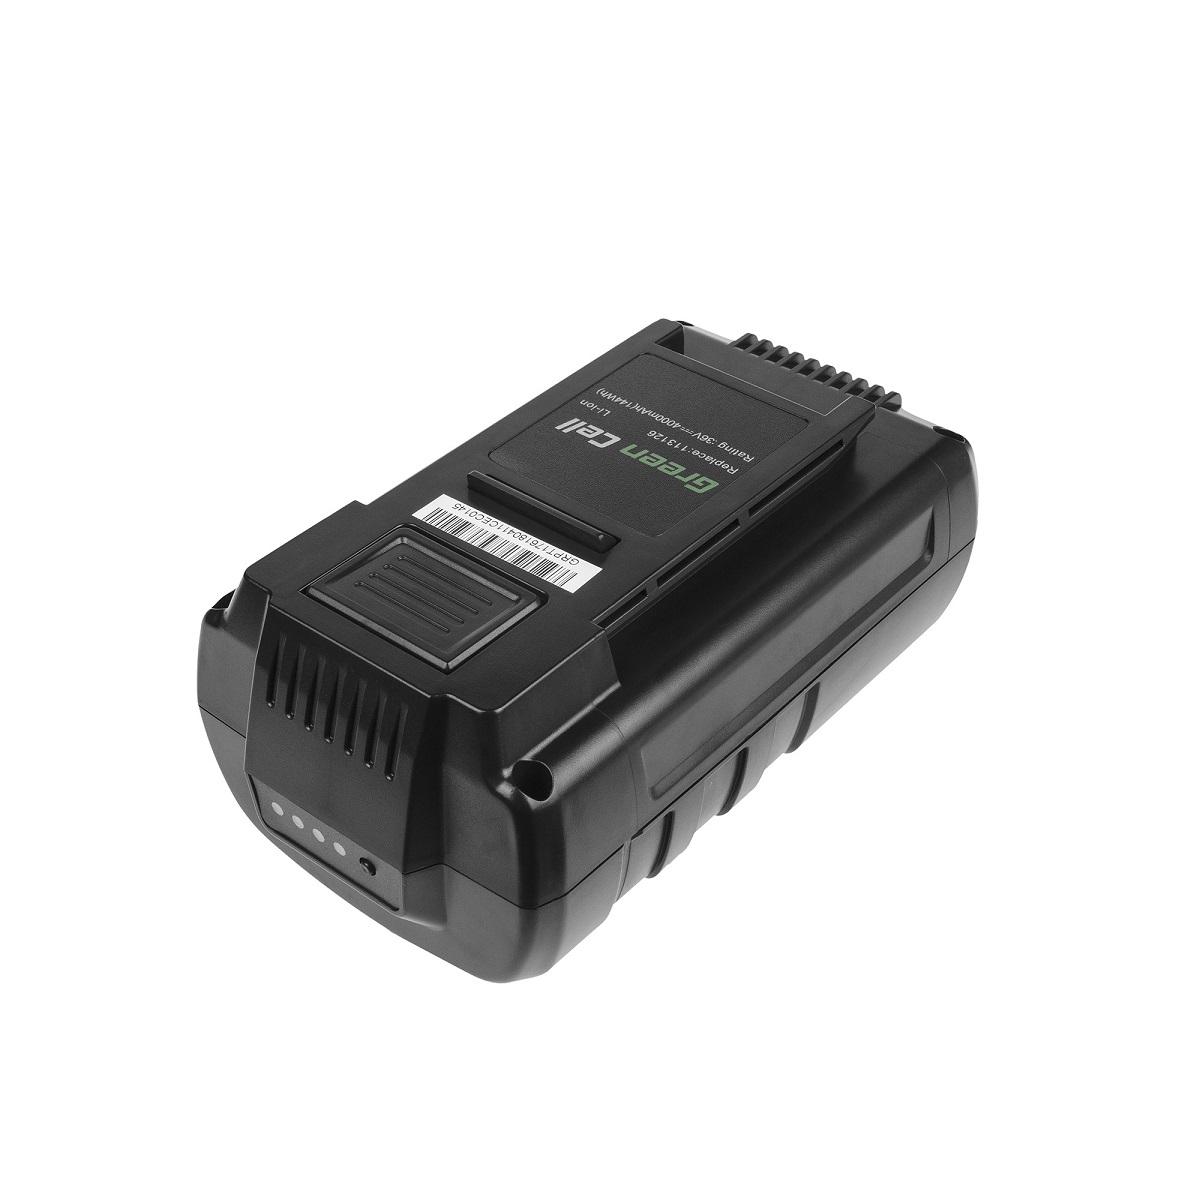 Batteri til AL-KO EnergyFlex (113280) 4000mah 36V (kompatibelt)